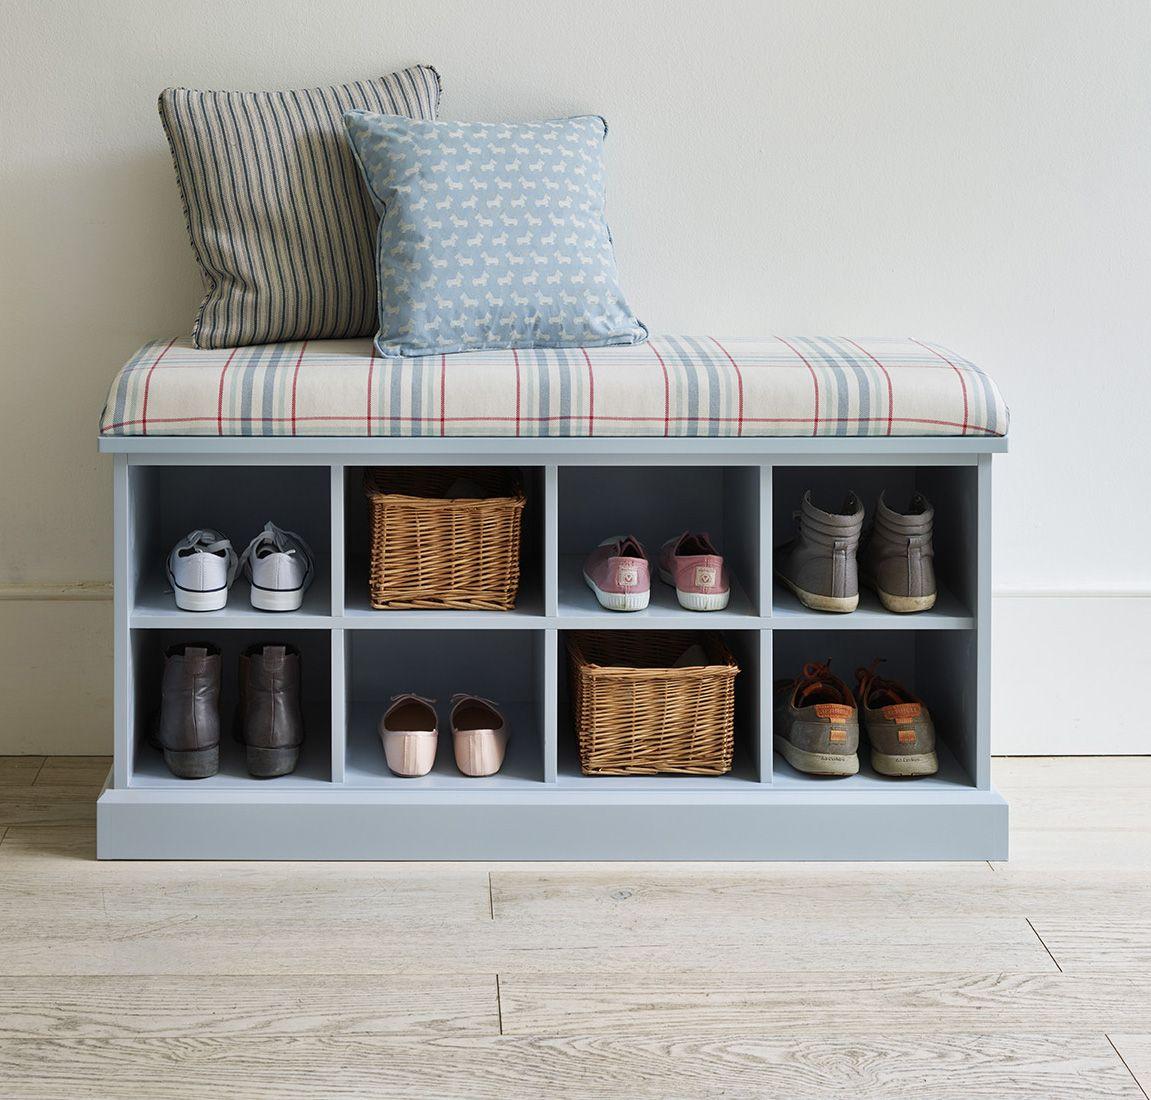 Storage ideas for hallway  Shoe bench  ספסלי כניסהנעלייםעם מדף  Pinterest  Shoe bench